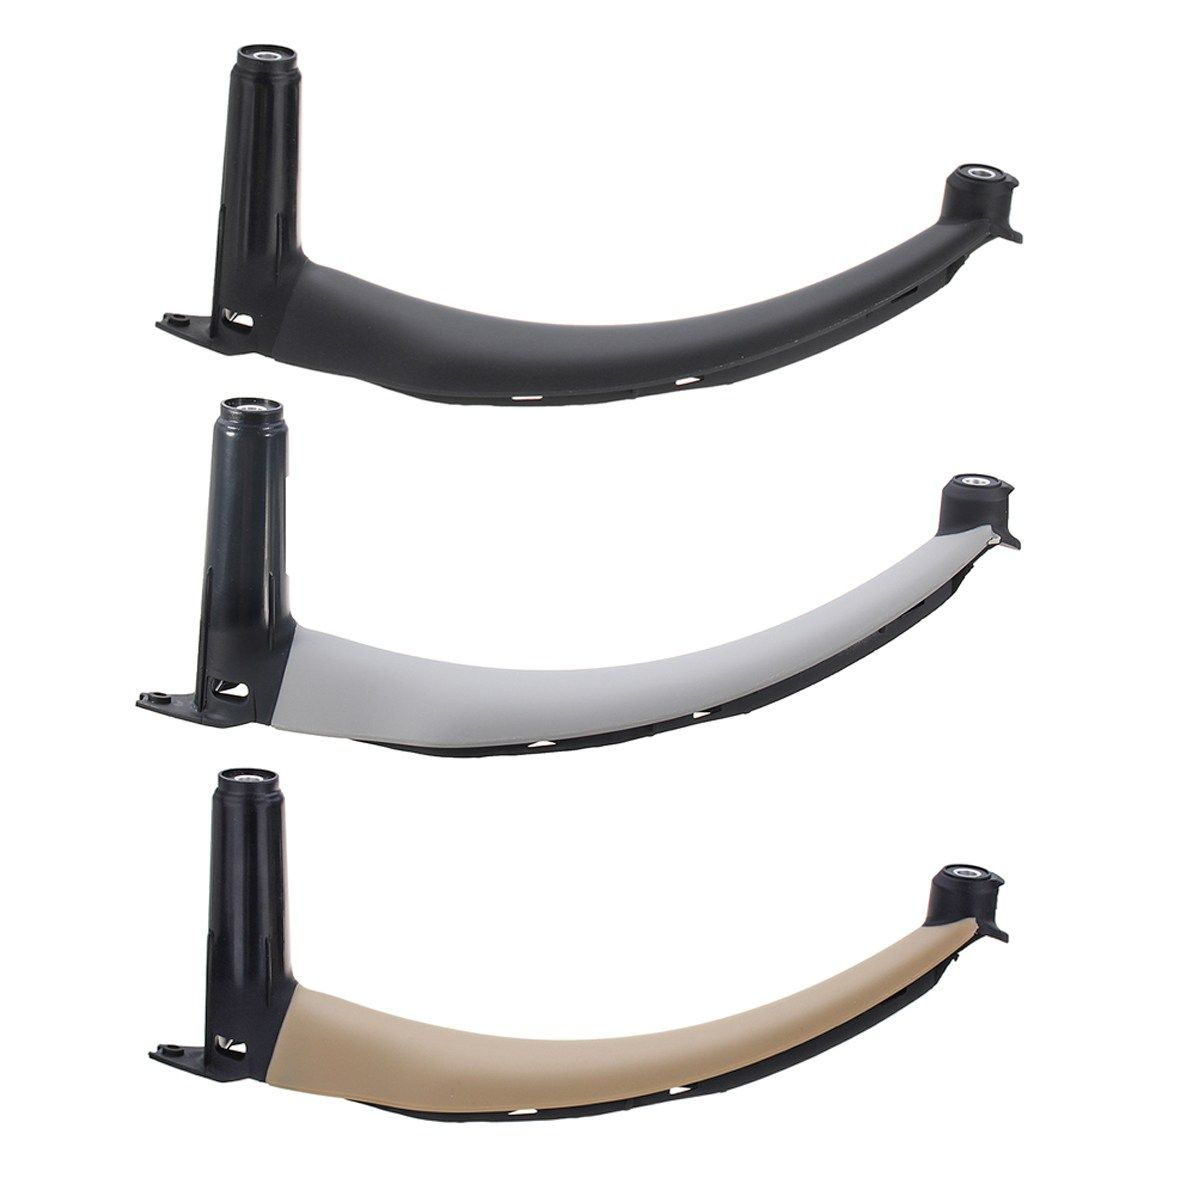 Car Right  Interior Door Handles Inner Door Panel Handle Pull Trim Cover For BMW E70 X5#51-41-6-969-404